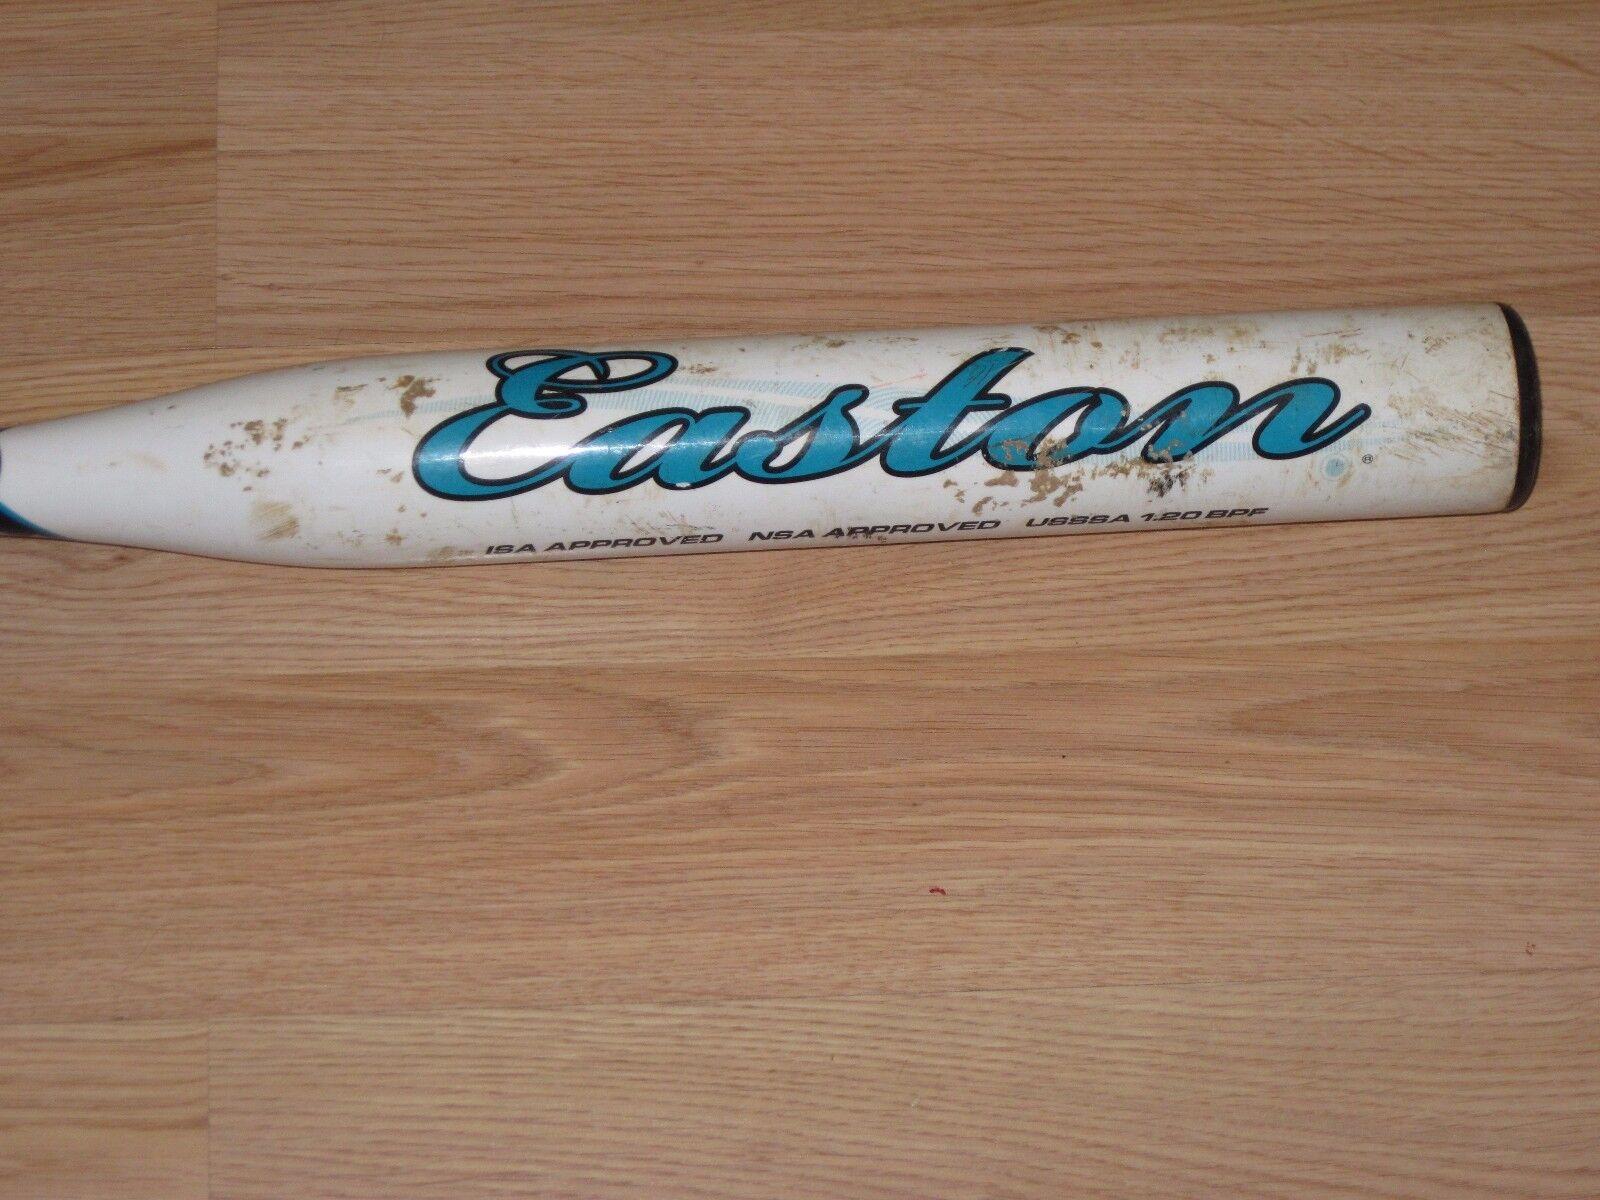 Easton Mystique Isa NSA usssa 1.20 SX66B 30  18.5 OZ Softbol bate -11.5 blancoo